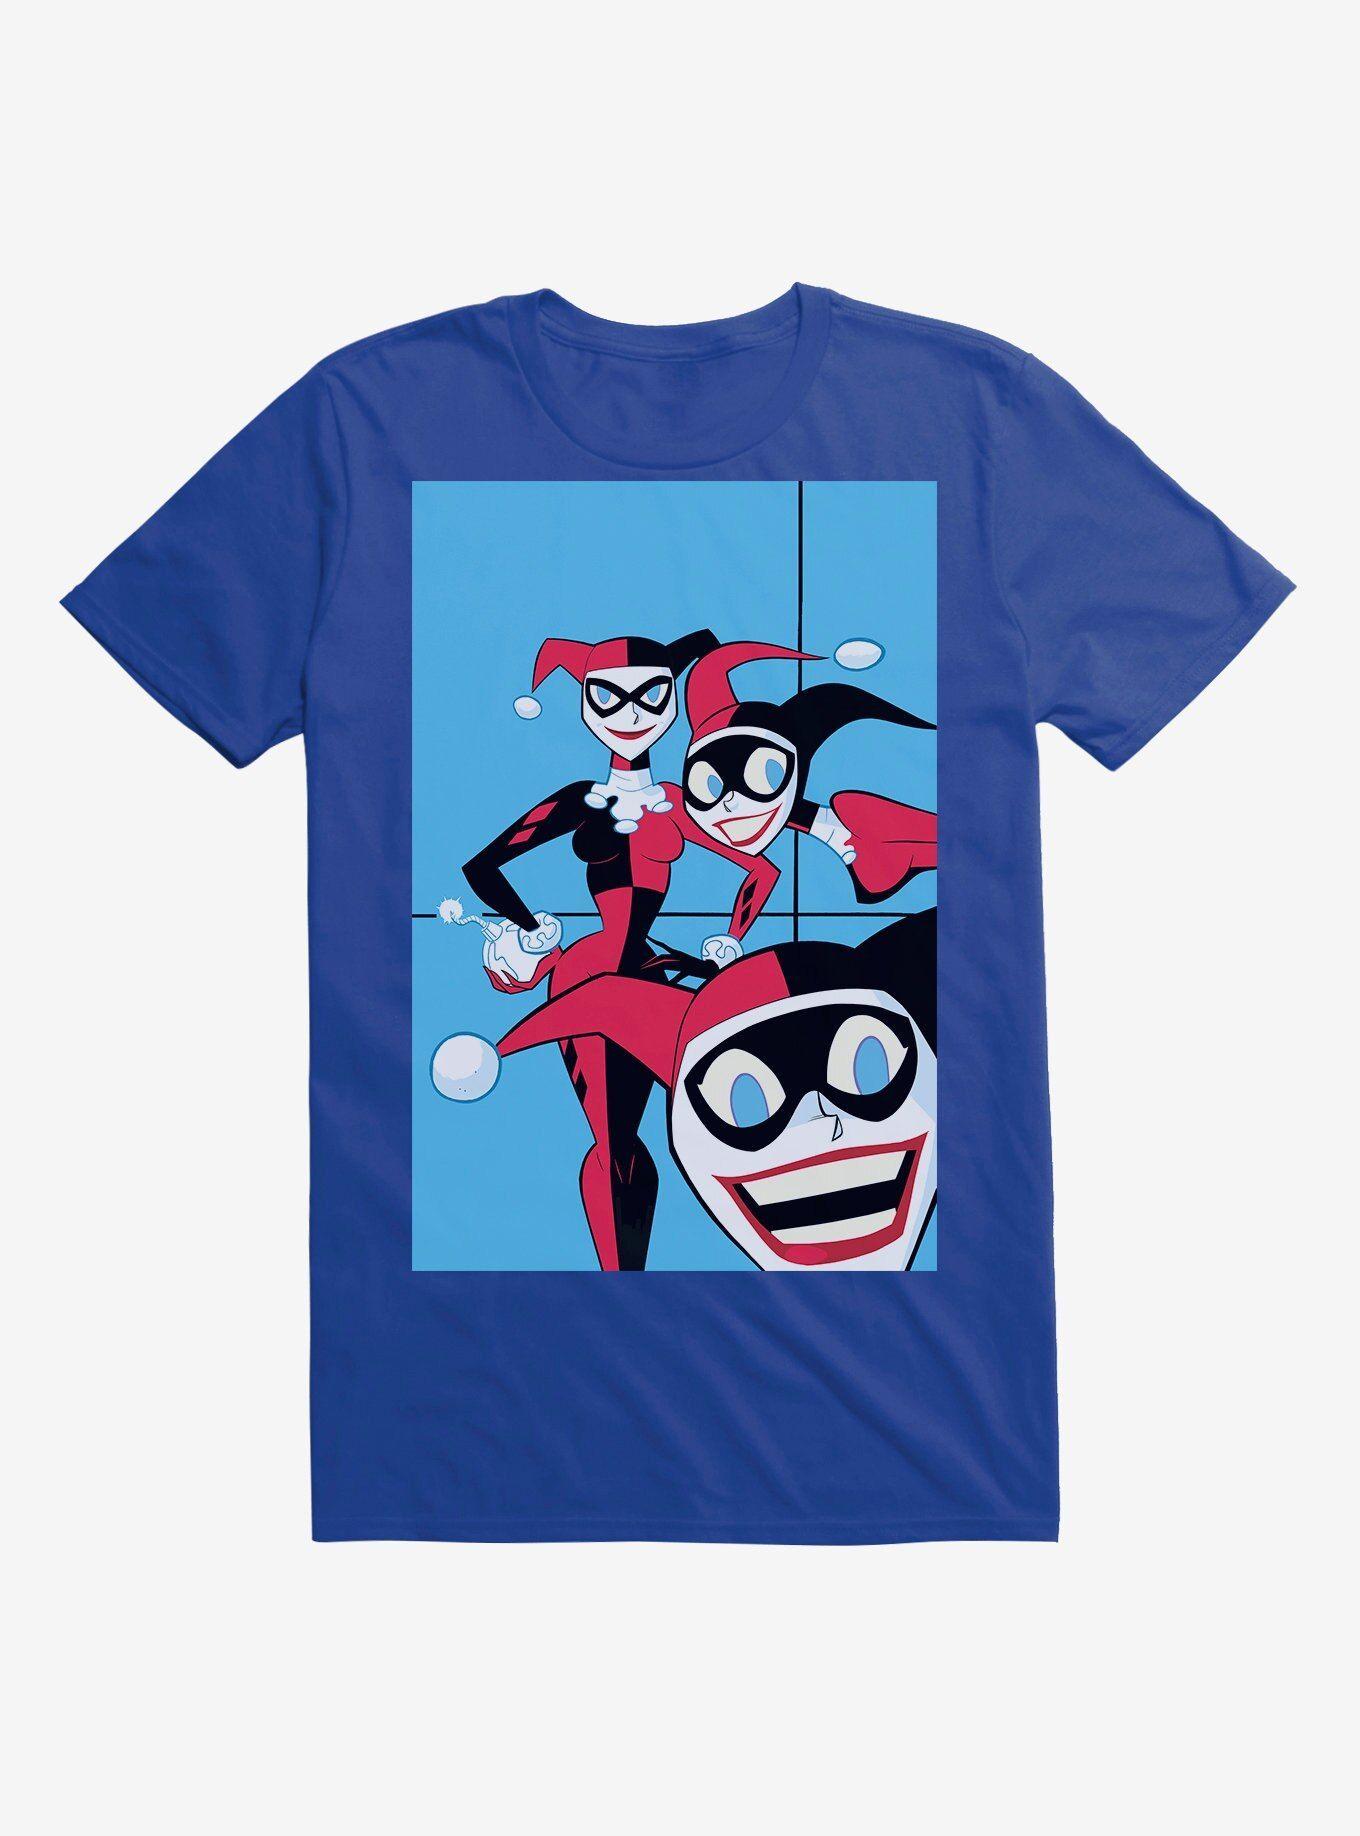 - DC Comics Batman Harley Quinn Clones Royal Blue T-Shirt, ROYAL BLUE  , Long Sleeve, Sweatshirt,